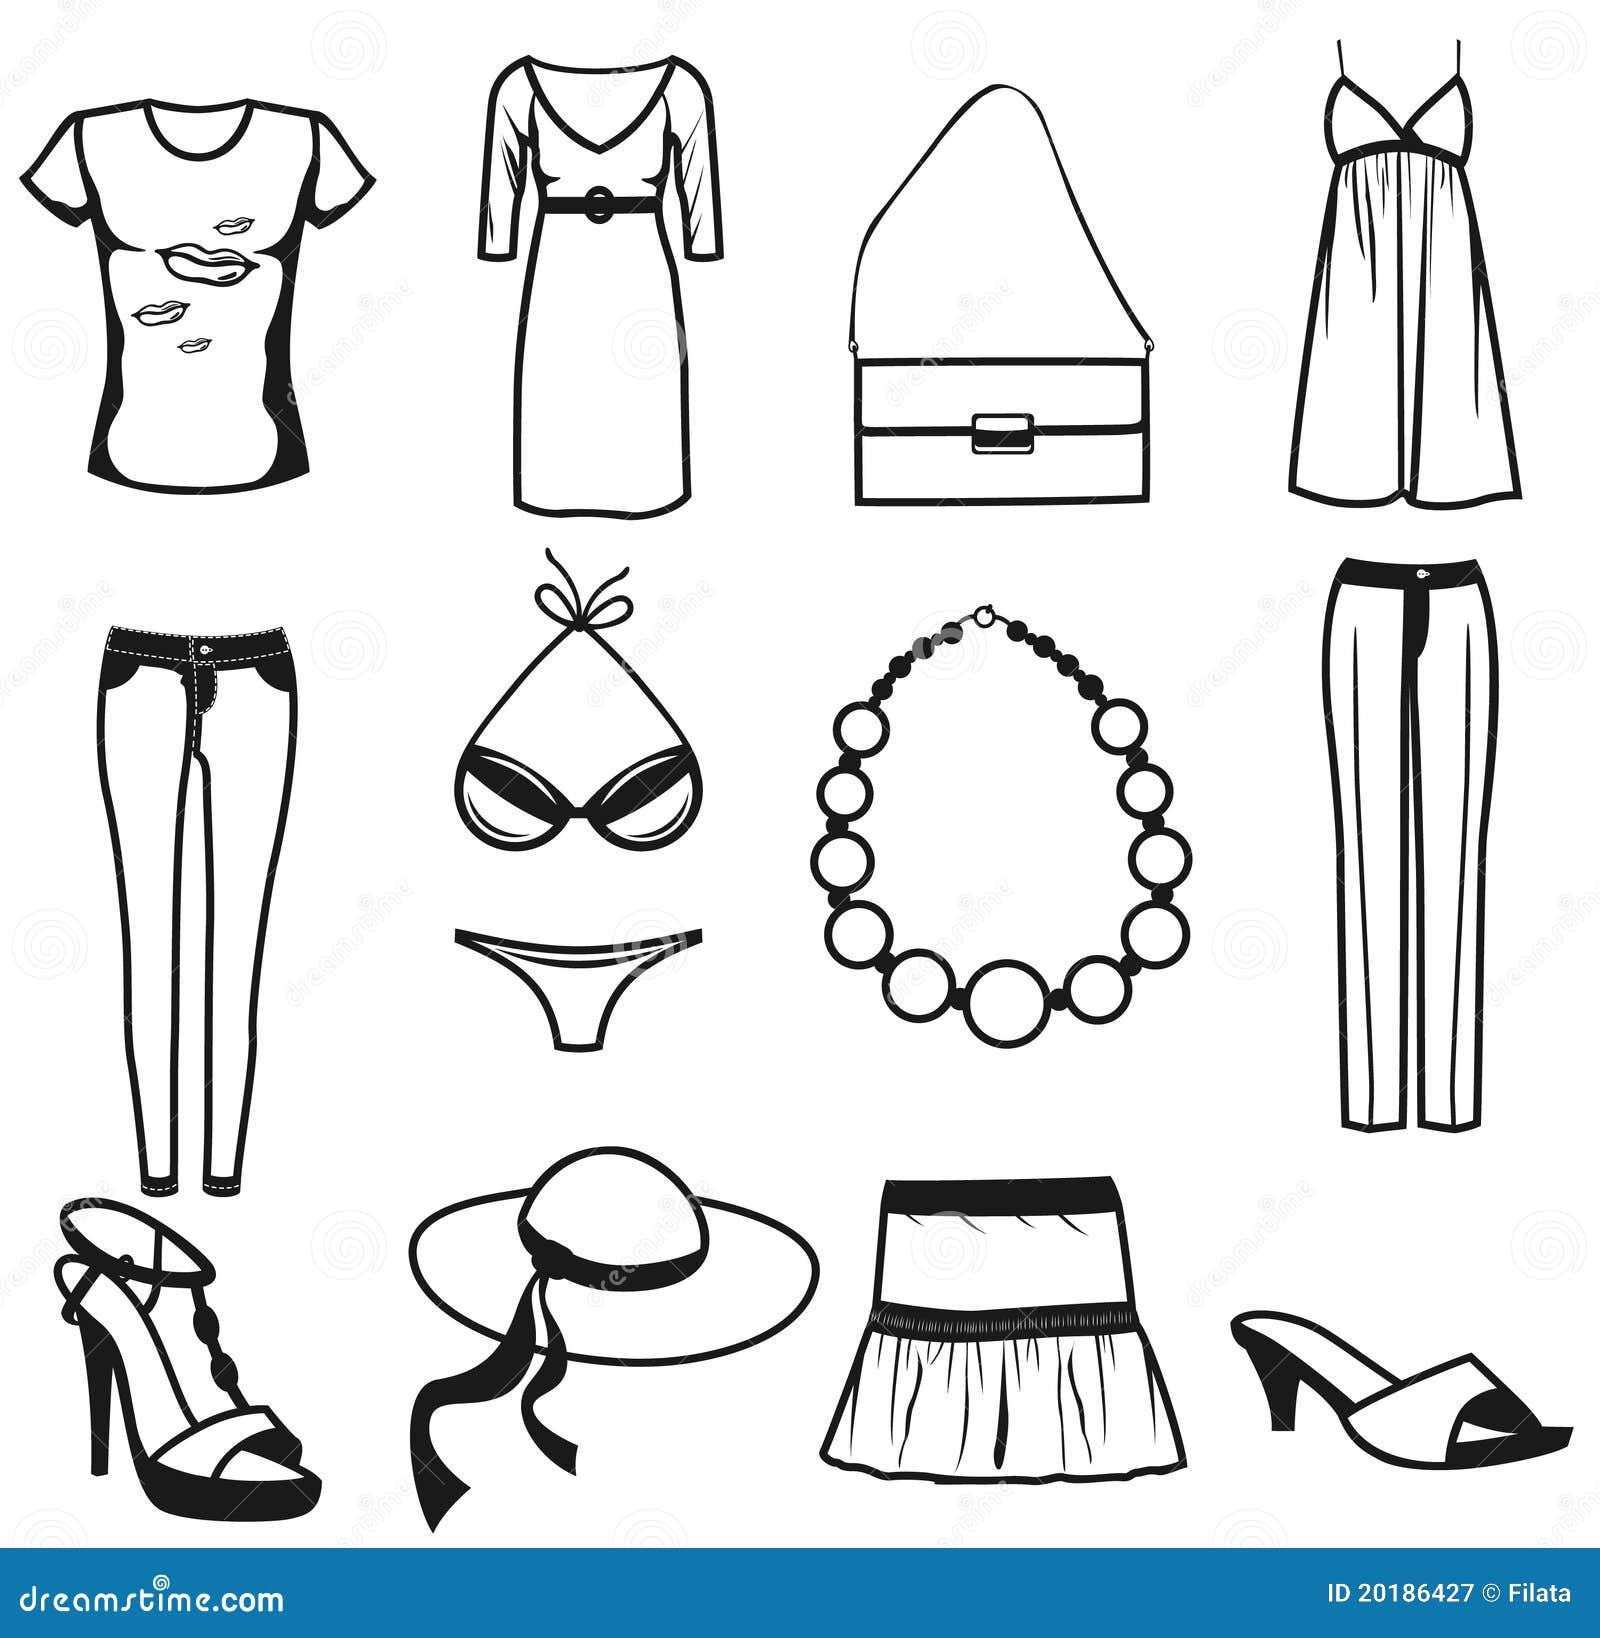 DIY dresses & skirts on Pinterest | Skirts, Skirt Tutorial and